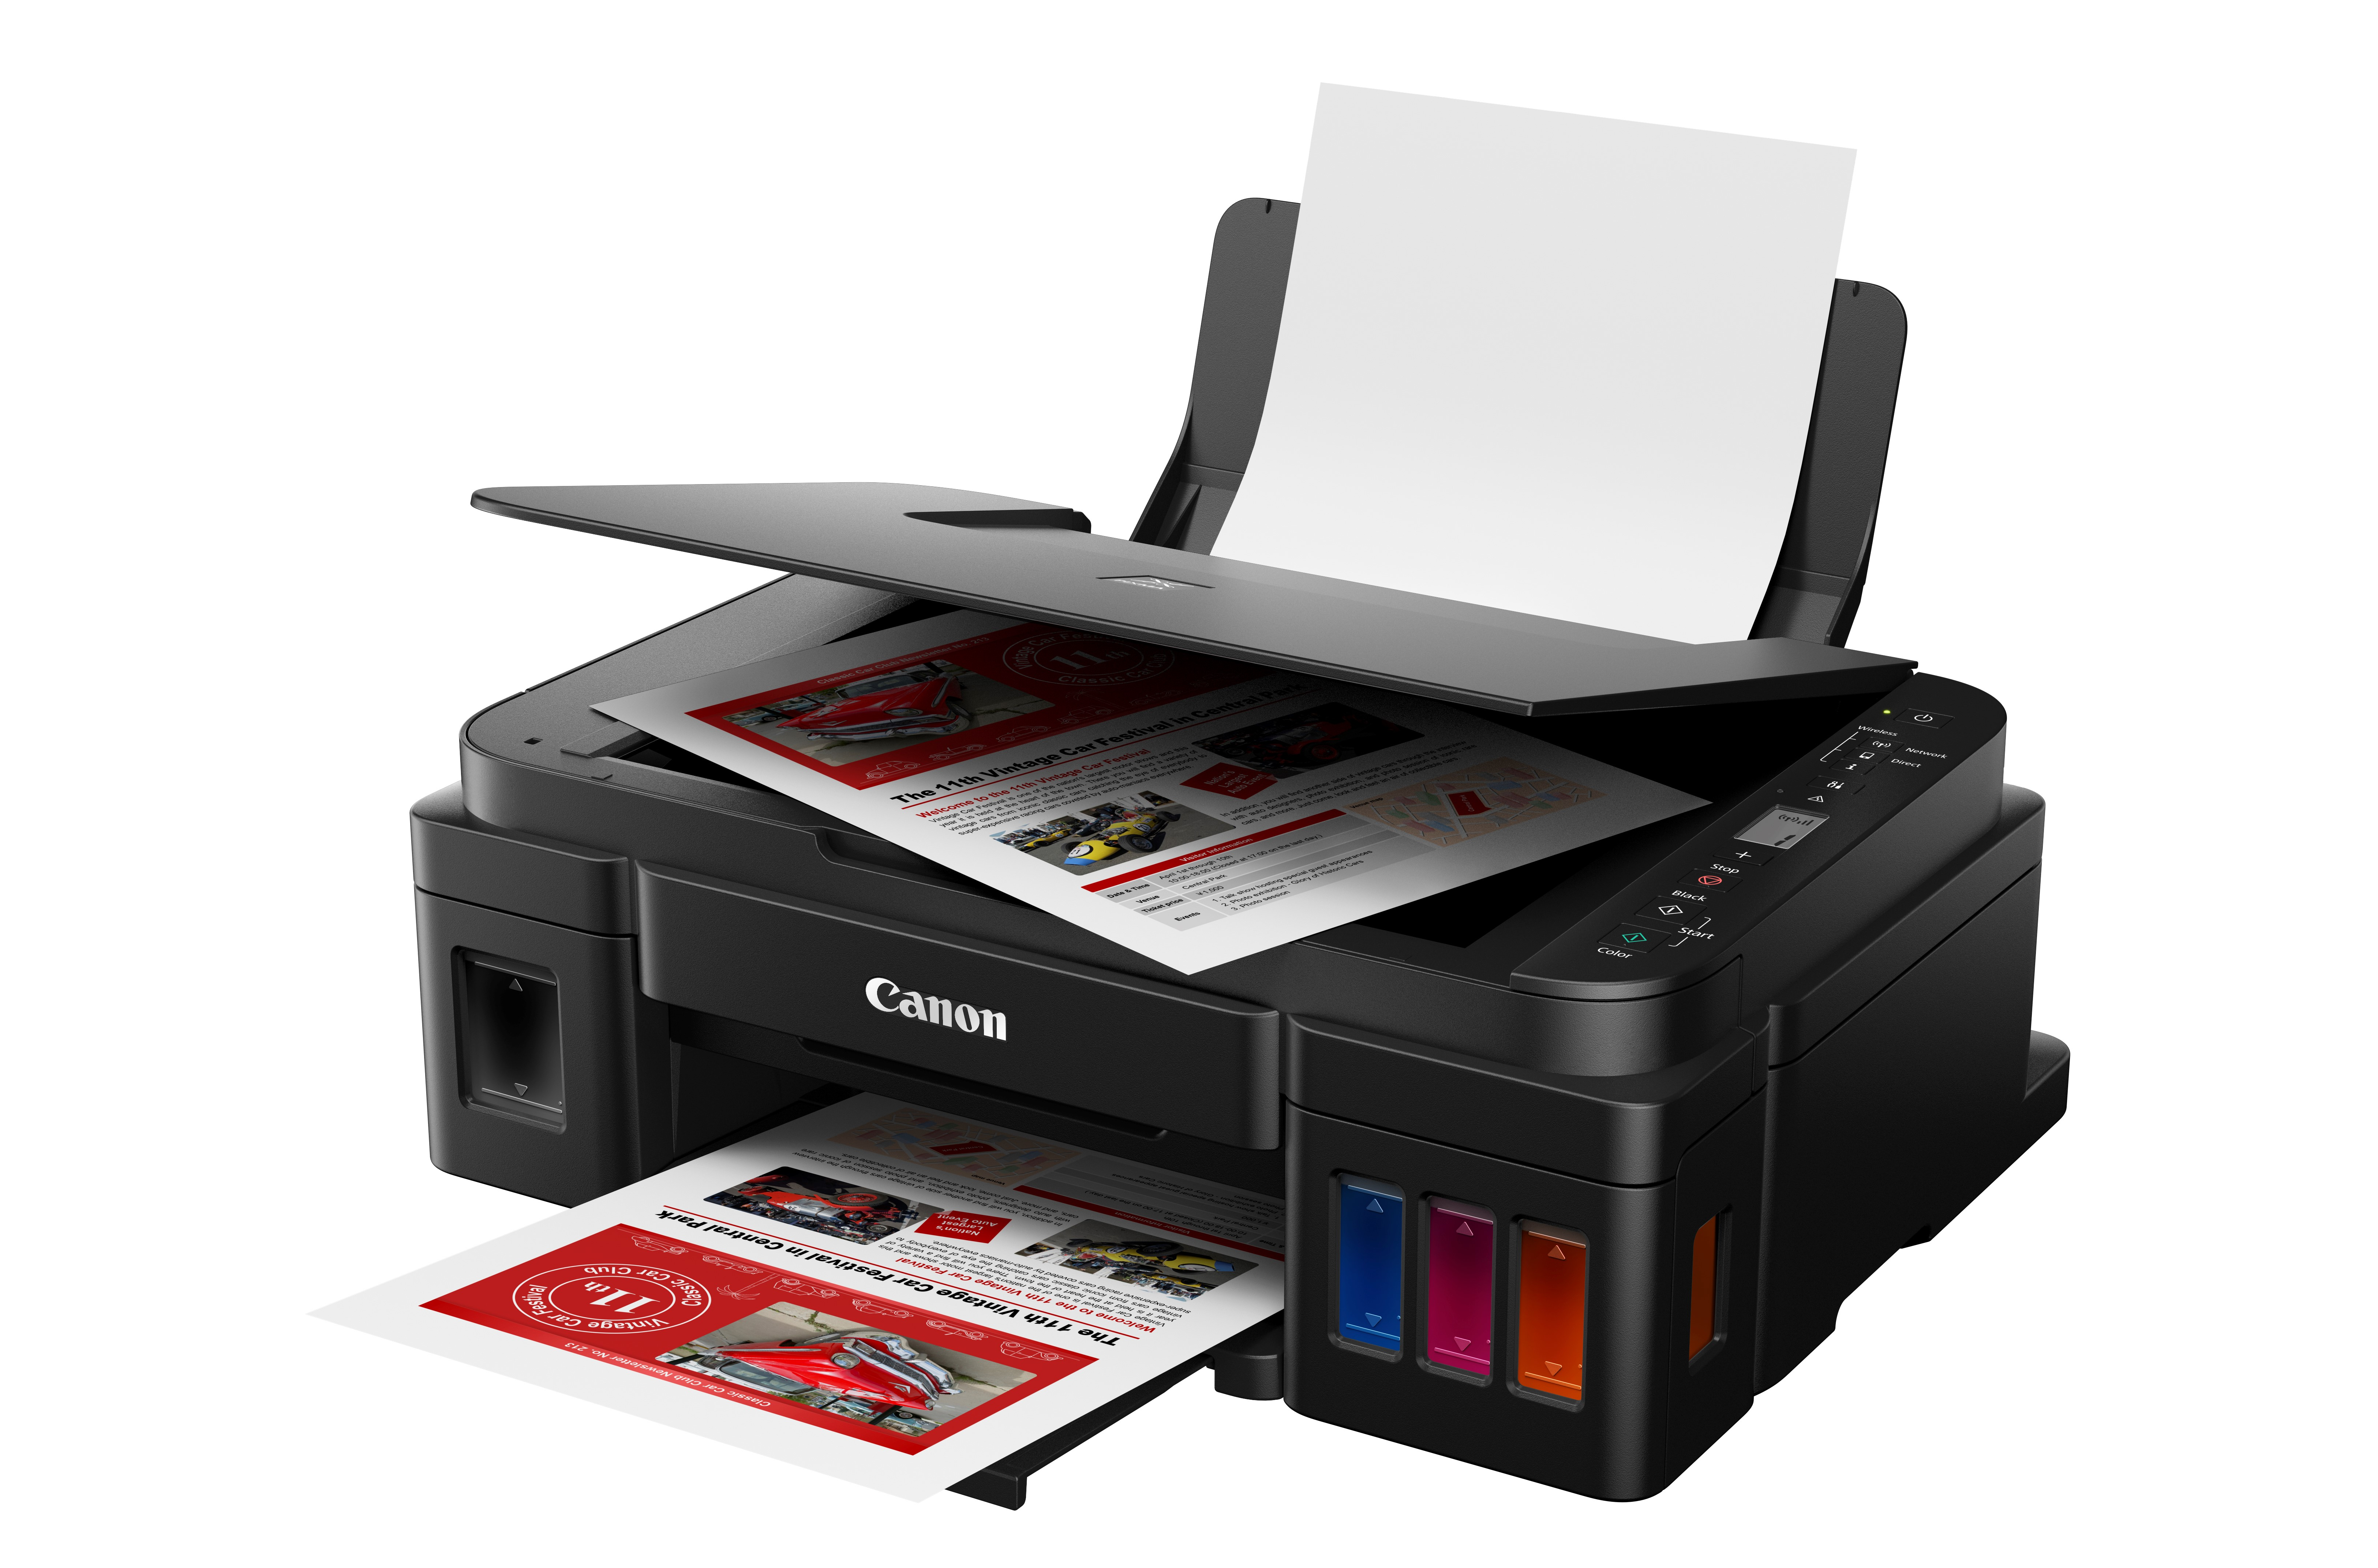 Impresora Canon Pixma 3110